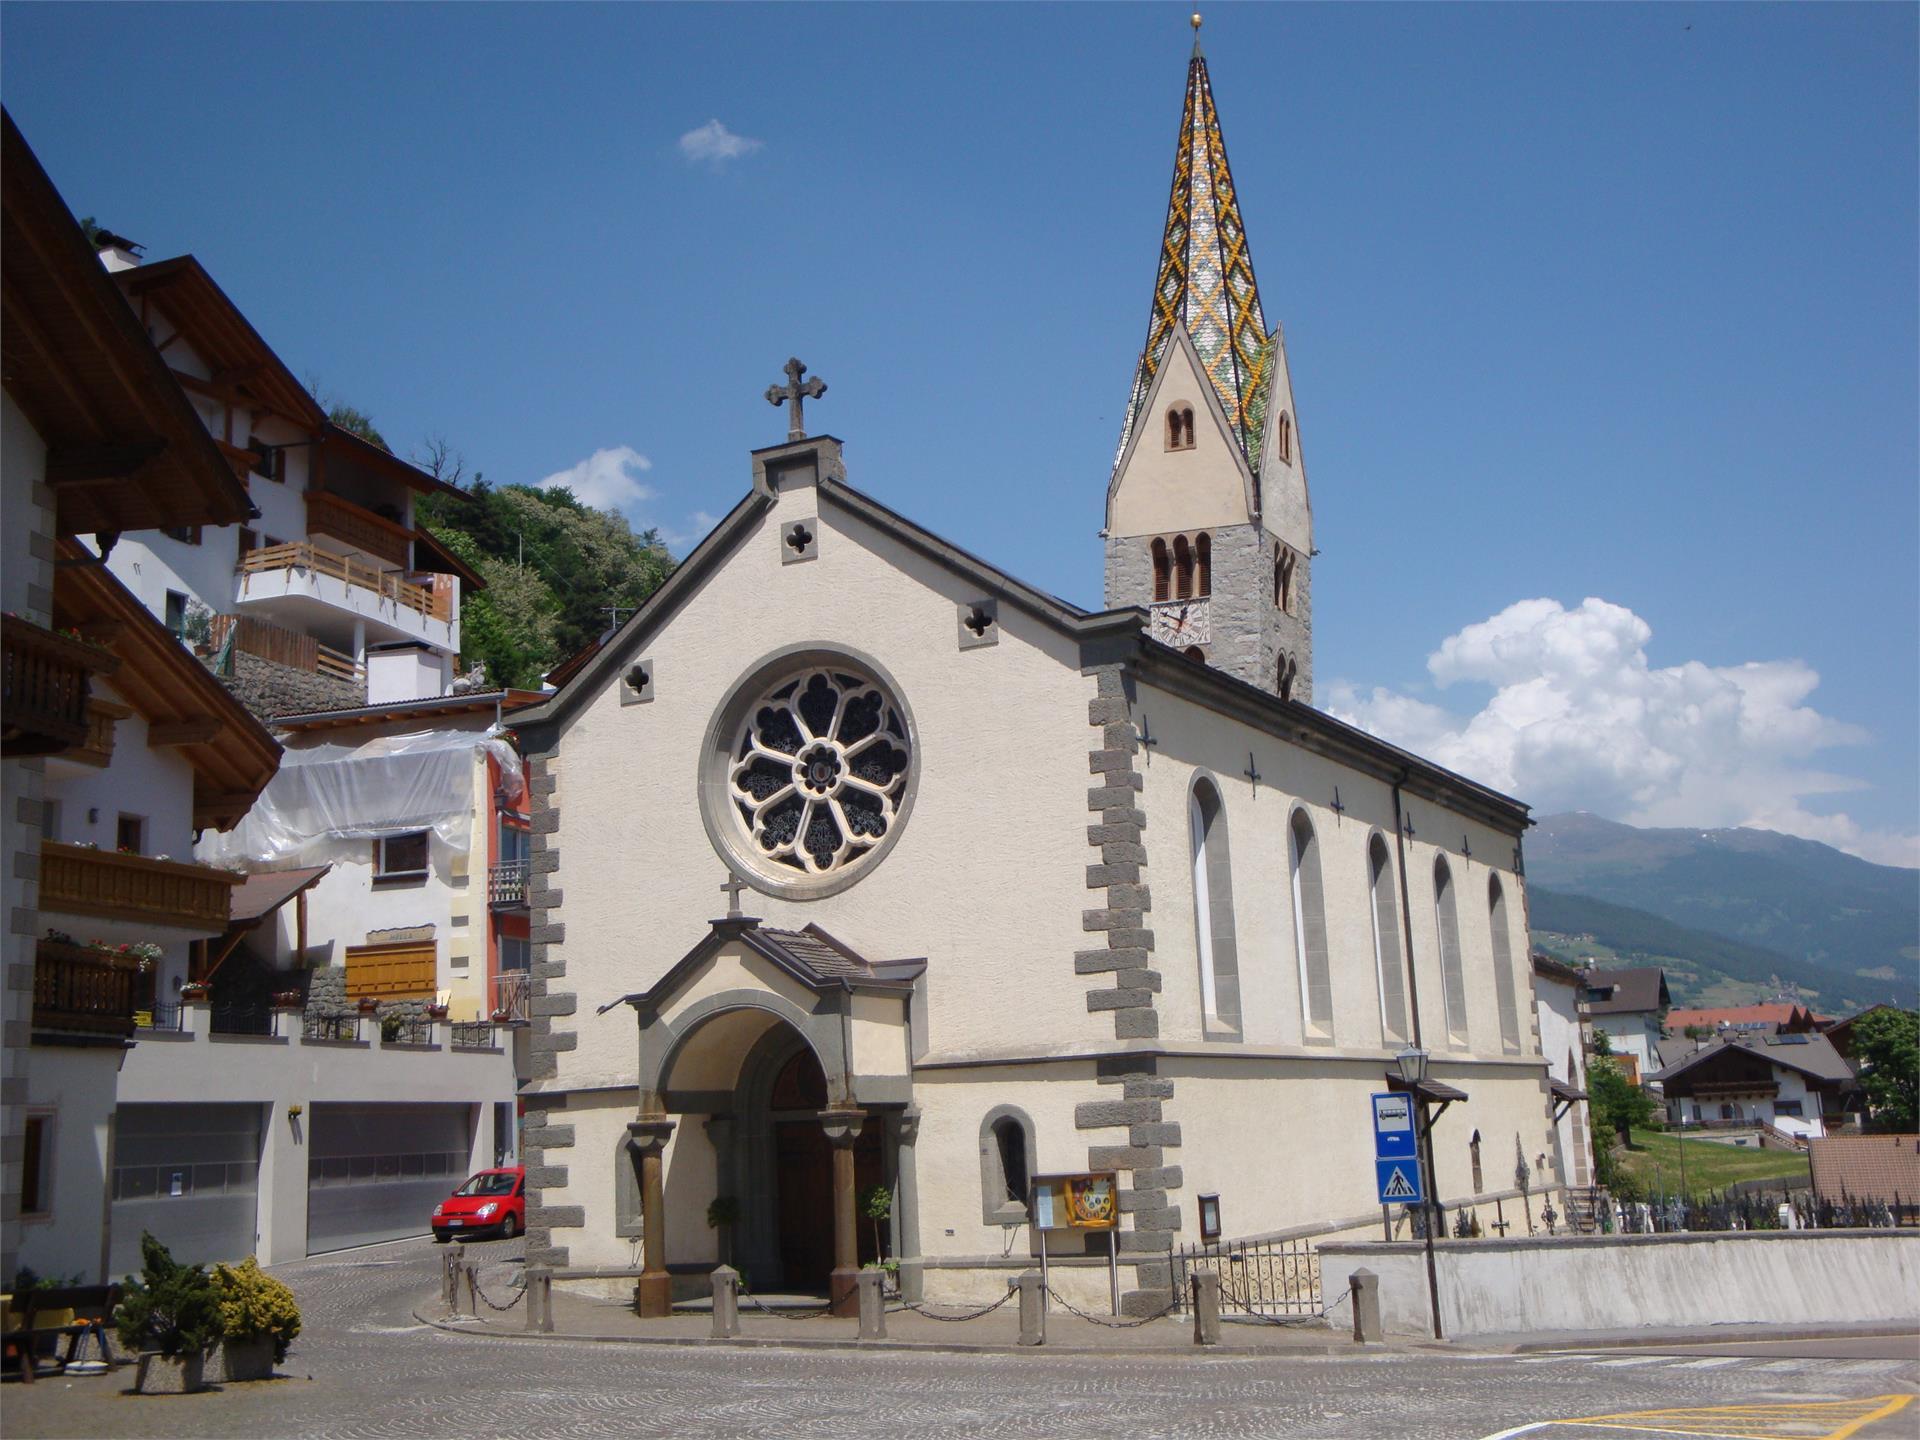 Pfarrkirche zum Hl. Jakobus in Barbian